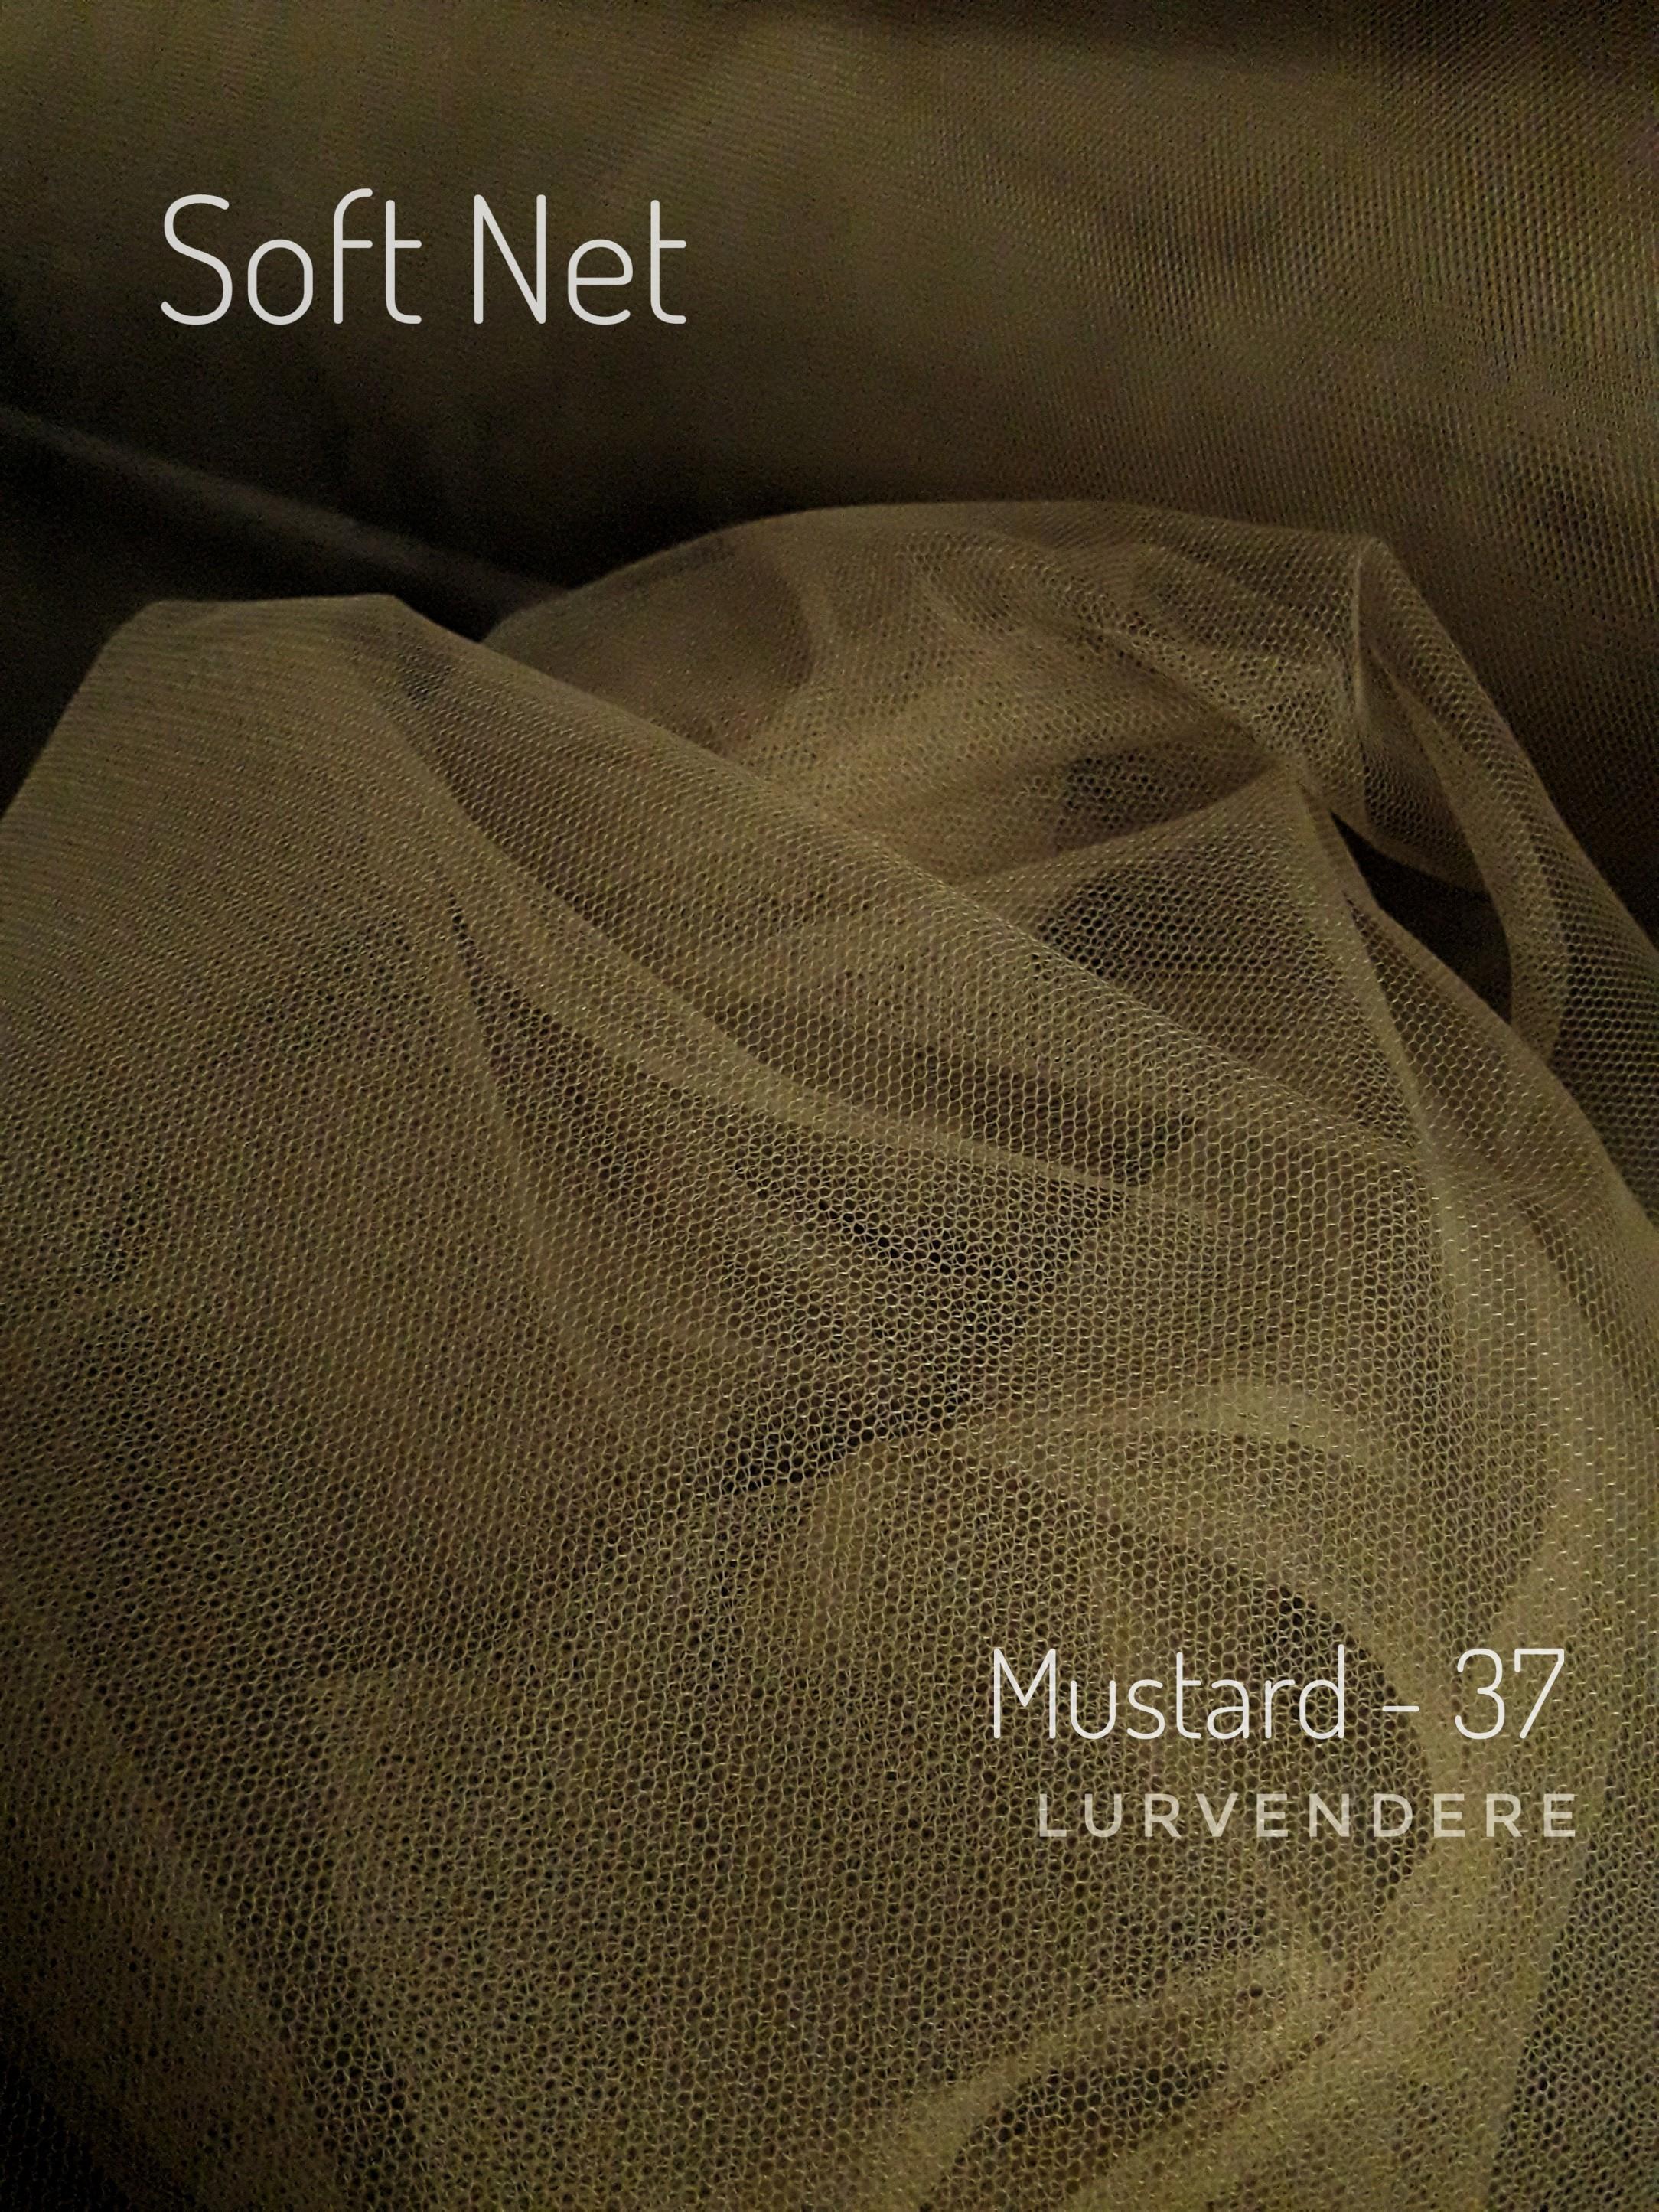 Soft Net - Mustard ( 37 )